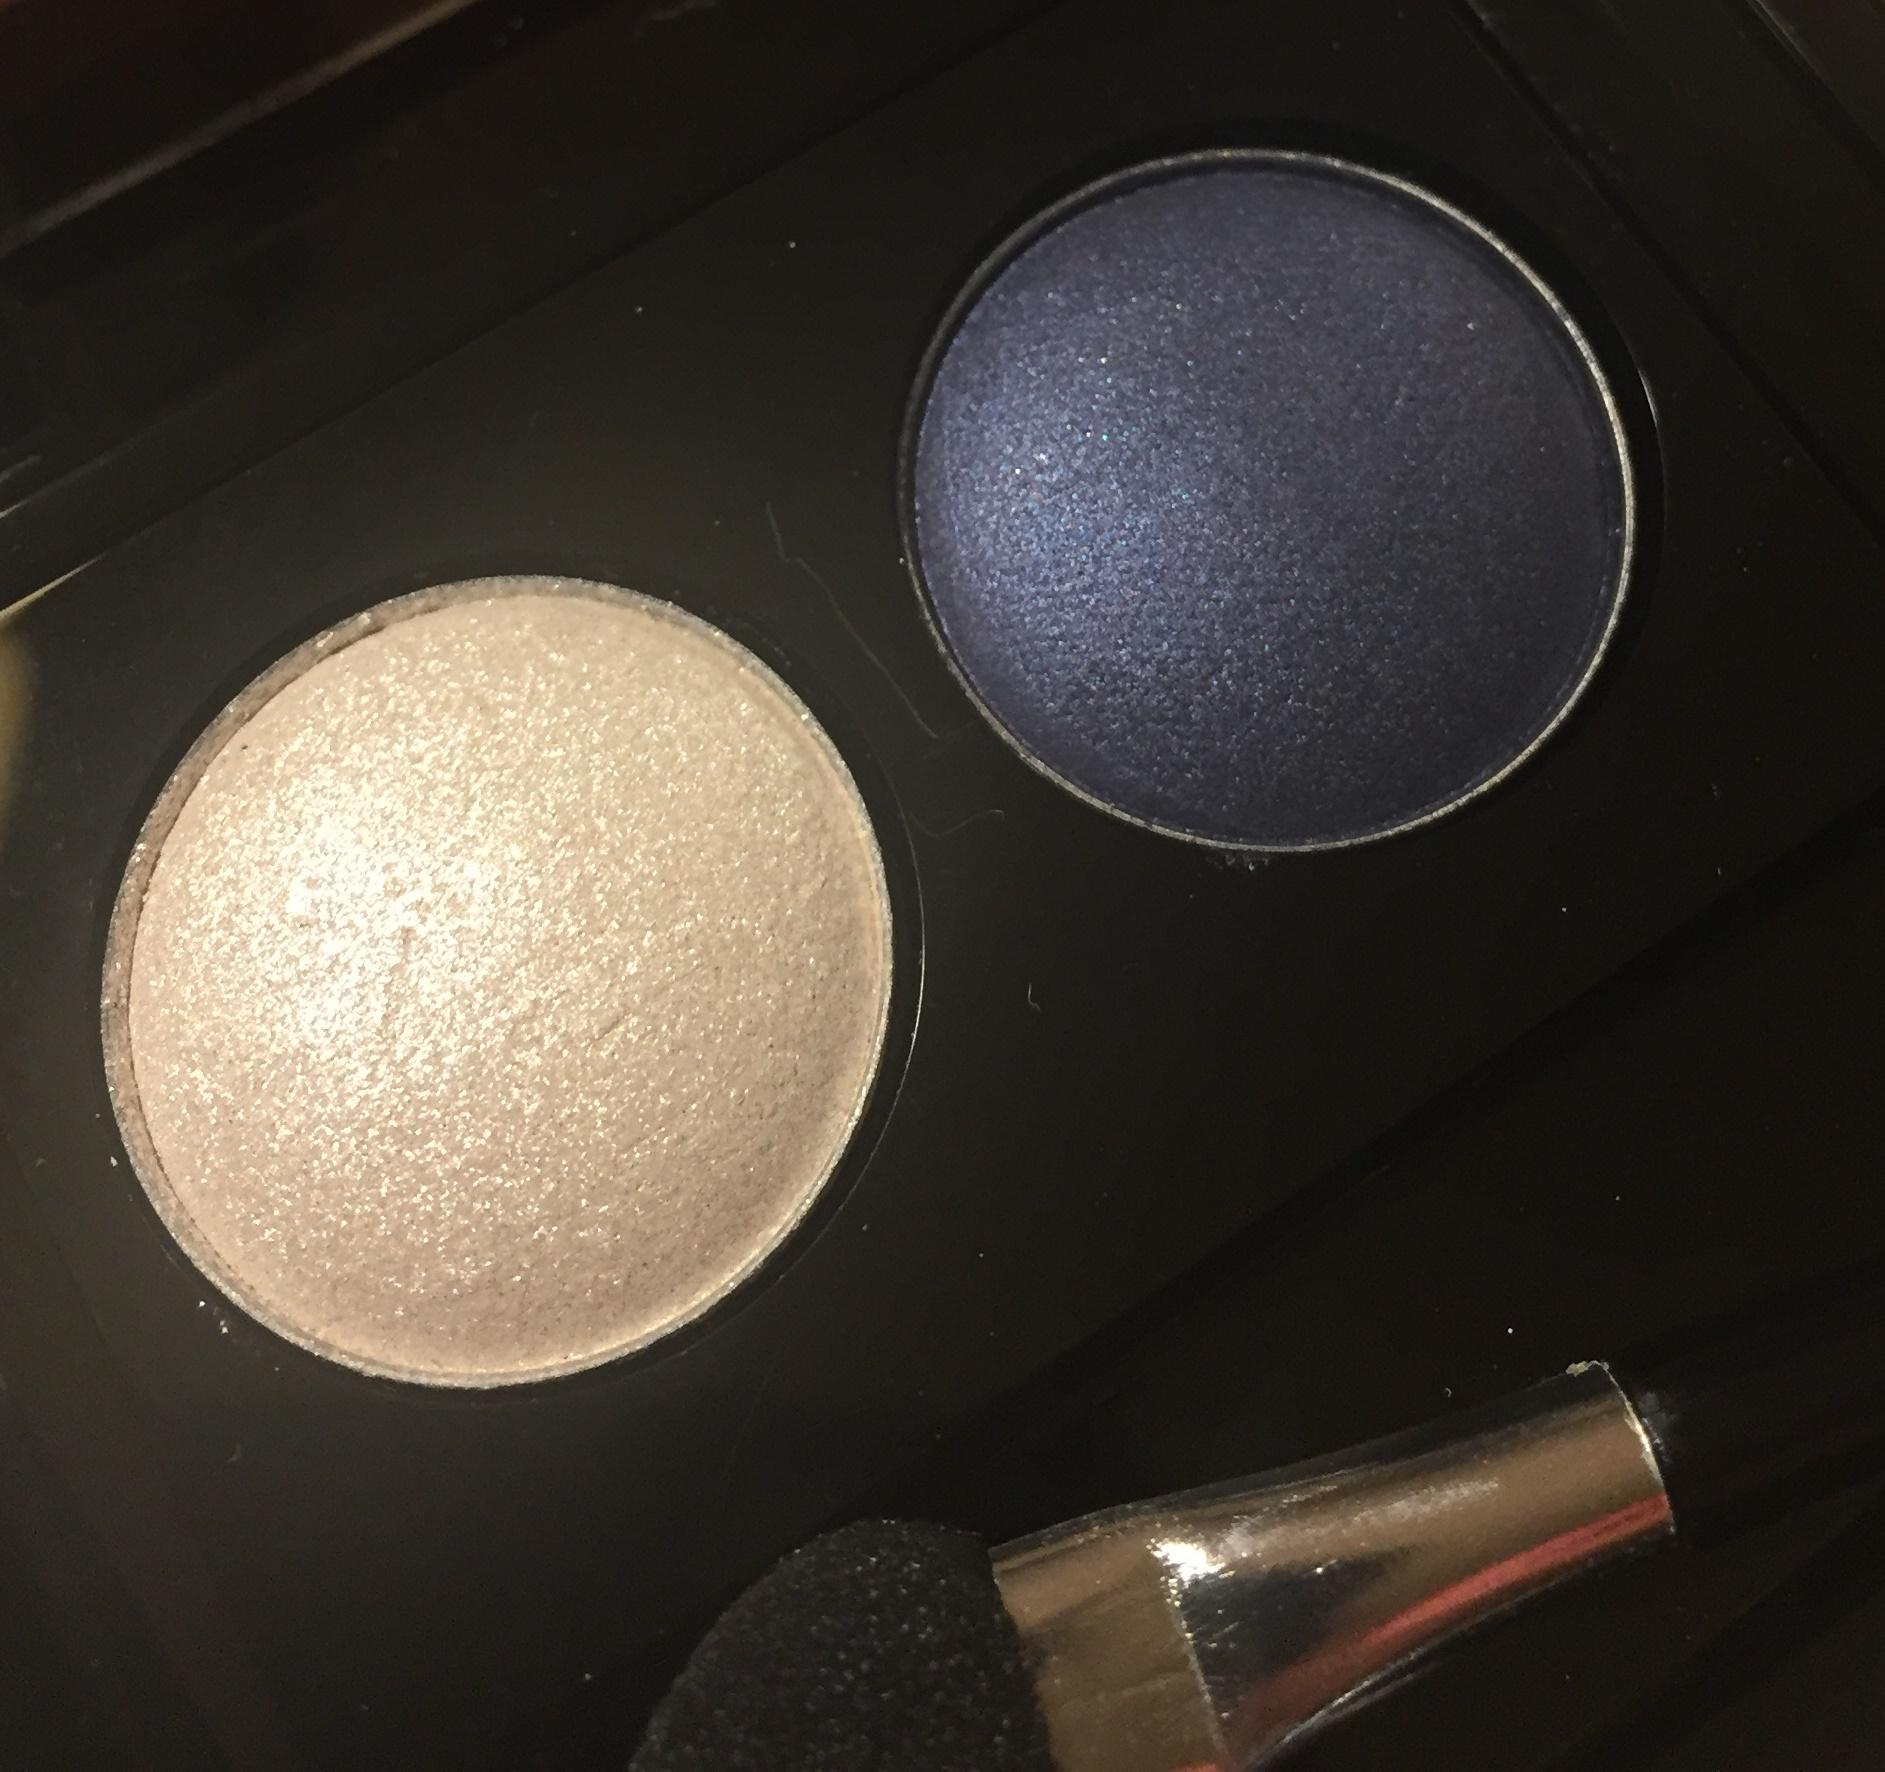 White & Dark blue, Eyeshadow palette, Rituals Makeup, Eyeshadow